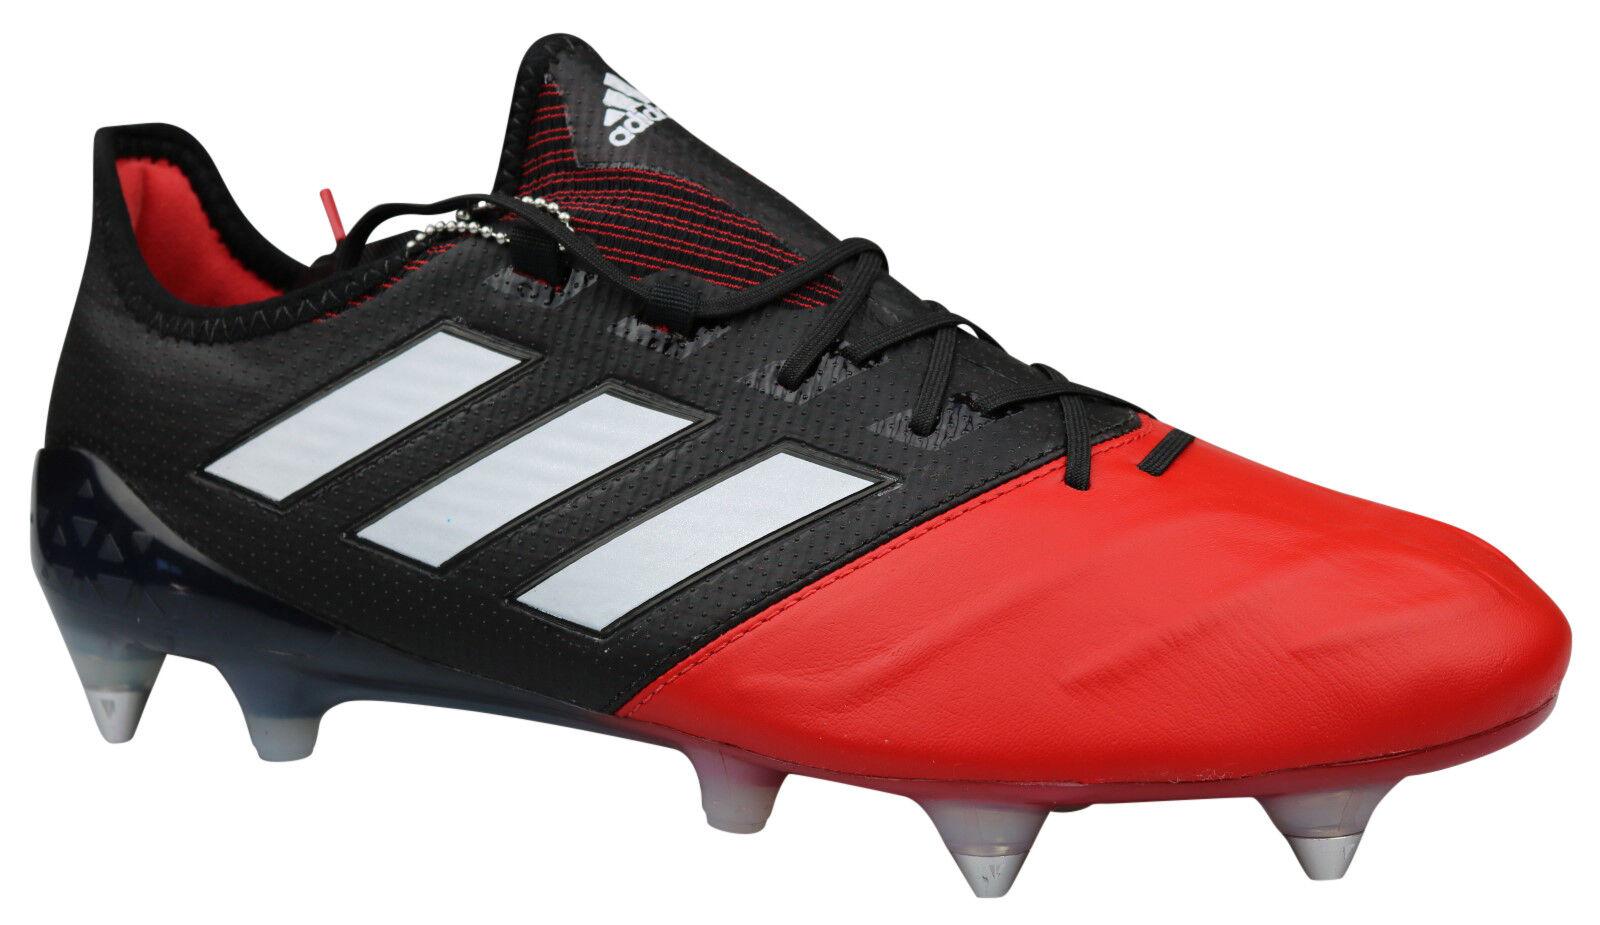 Adidas Sg Stollen 17 Ok8nwx0p Fußballschuhe Für X 1 Schuhe Waqft766 TFJ1uclK35